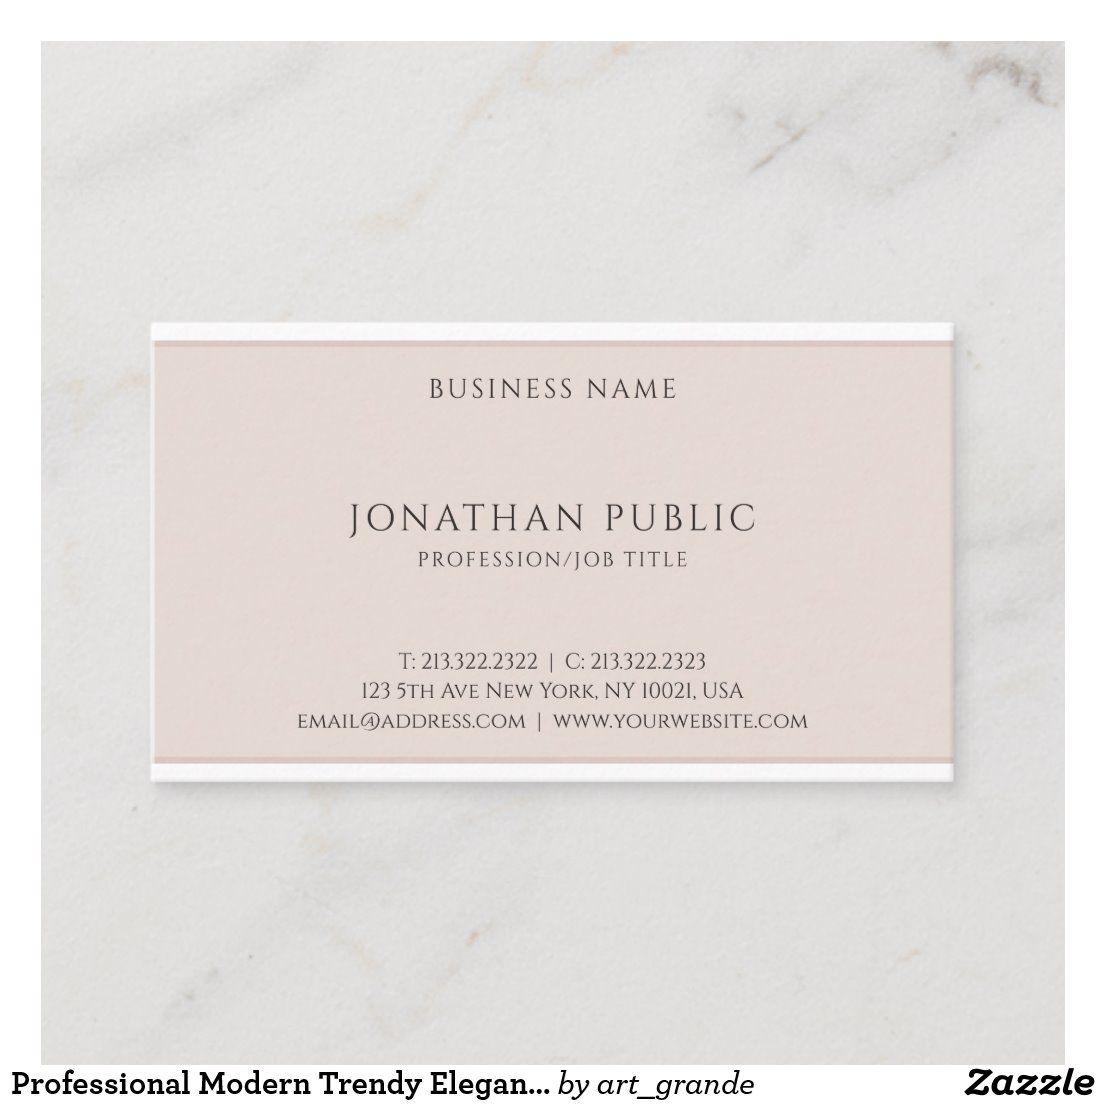 Professional Modern Trendy Elegant Template Business Card